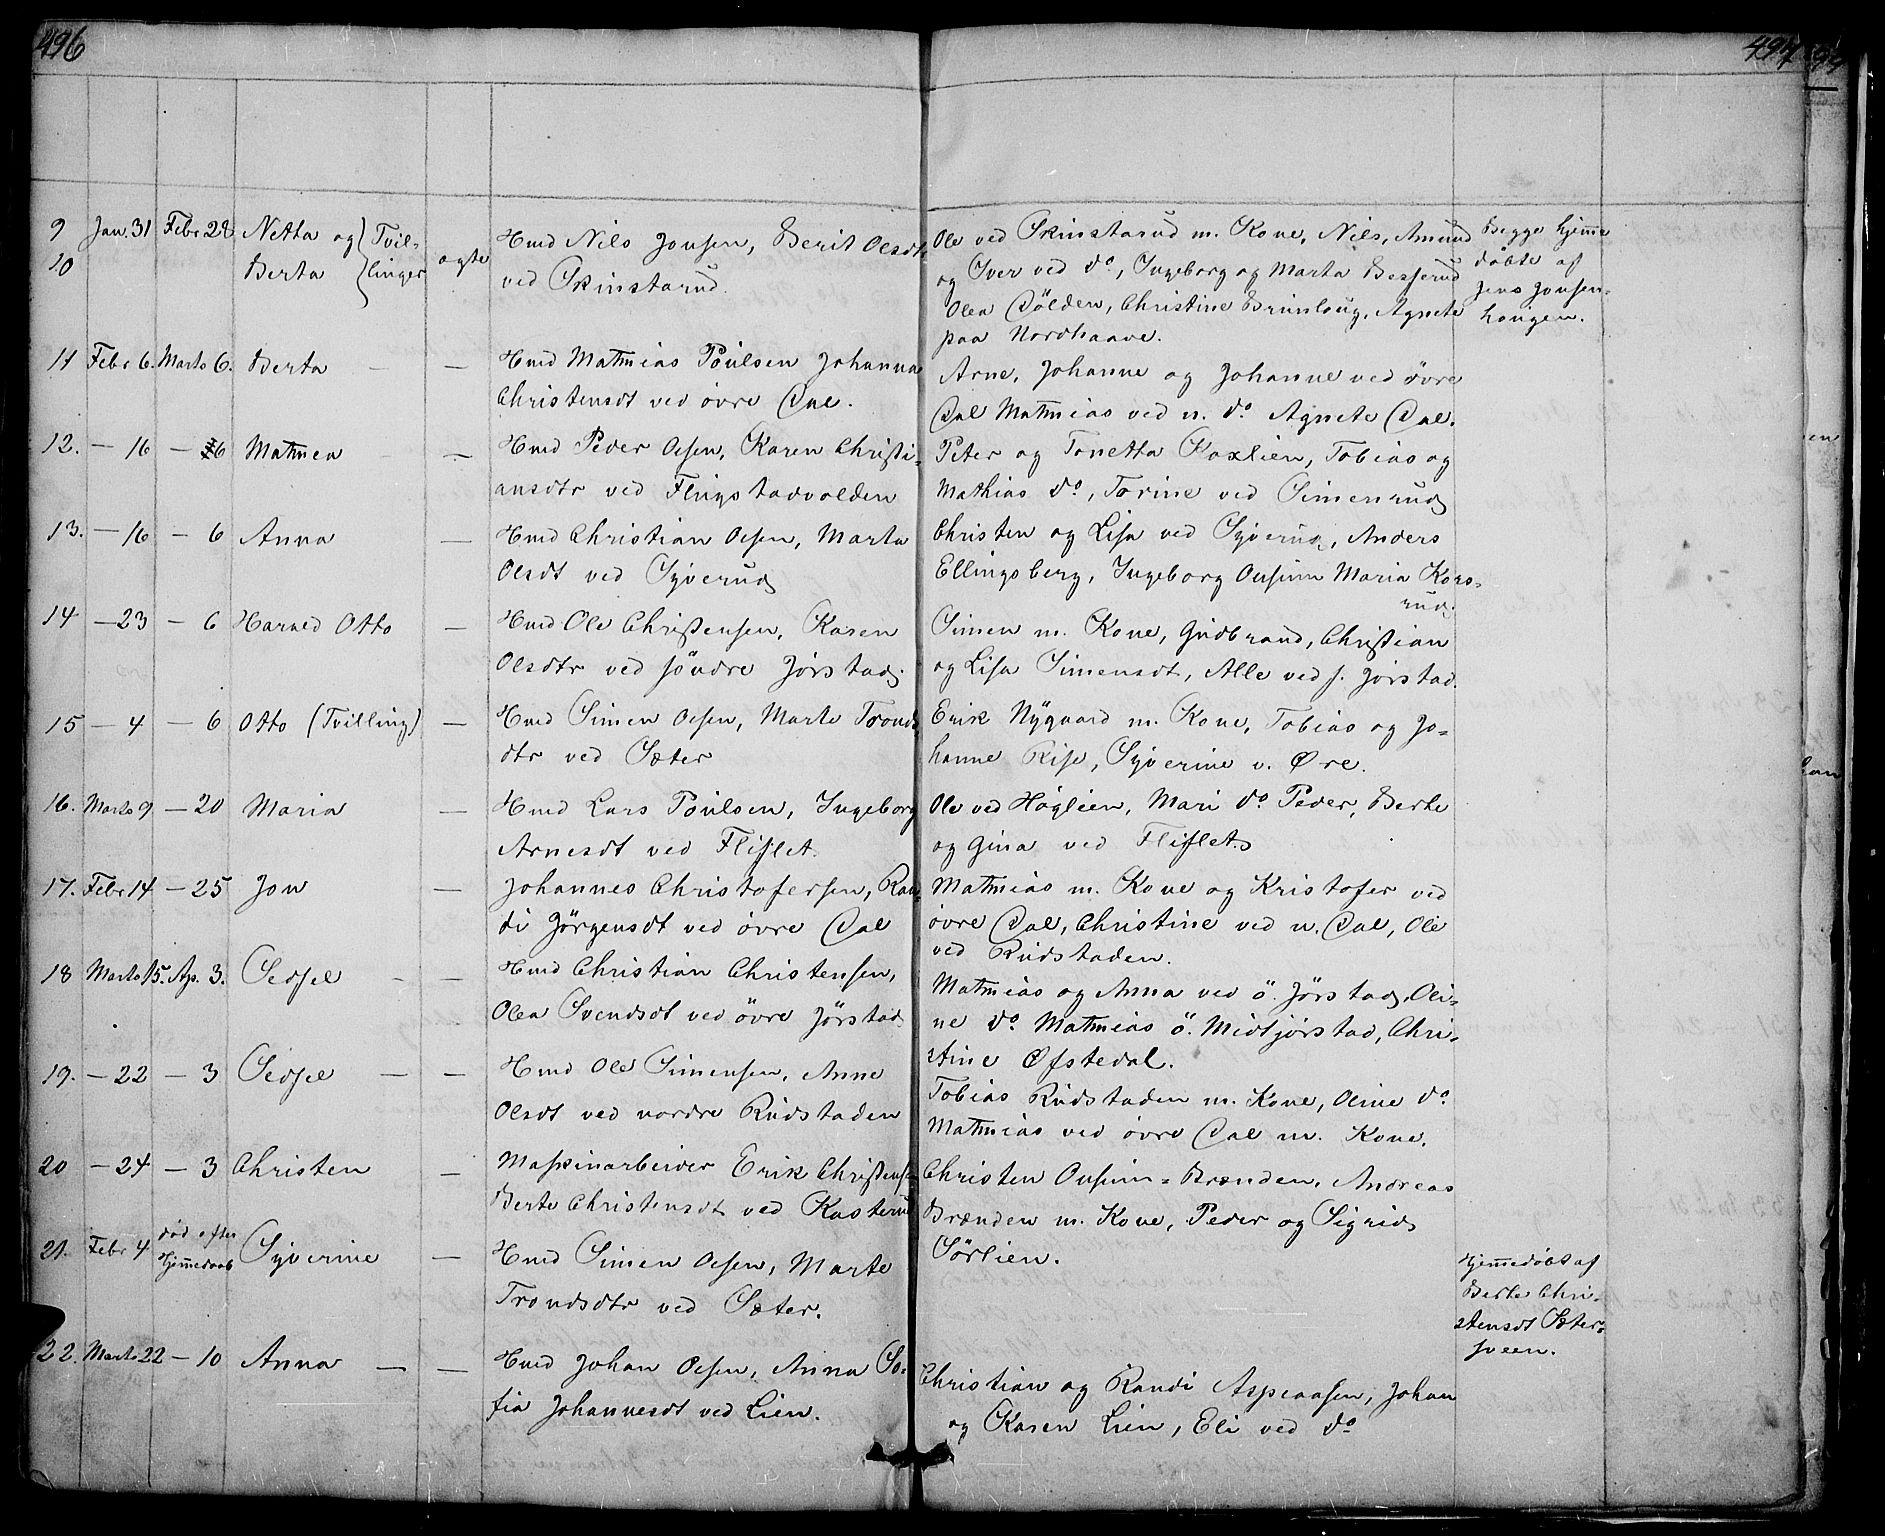 SAH, Fåberg prestekontor, H/Ha/Hab/L0005: Klokkerbok nr. 5, 1837-1864, s. 496-497